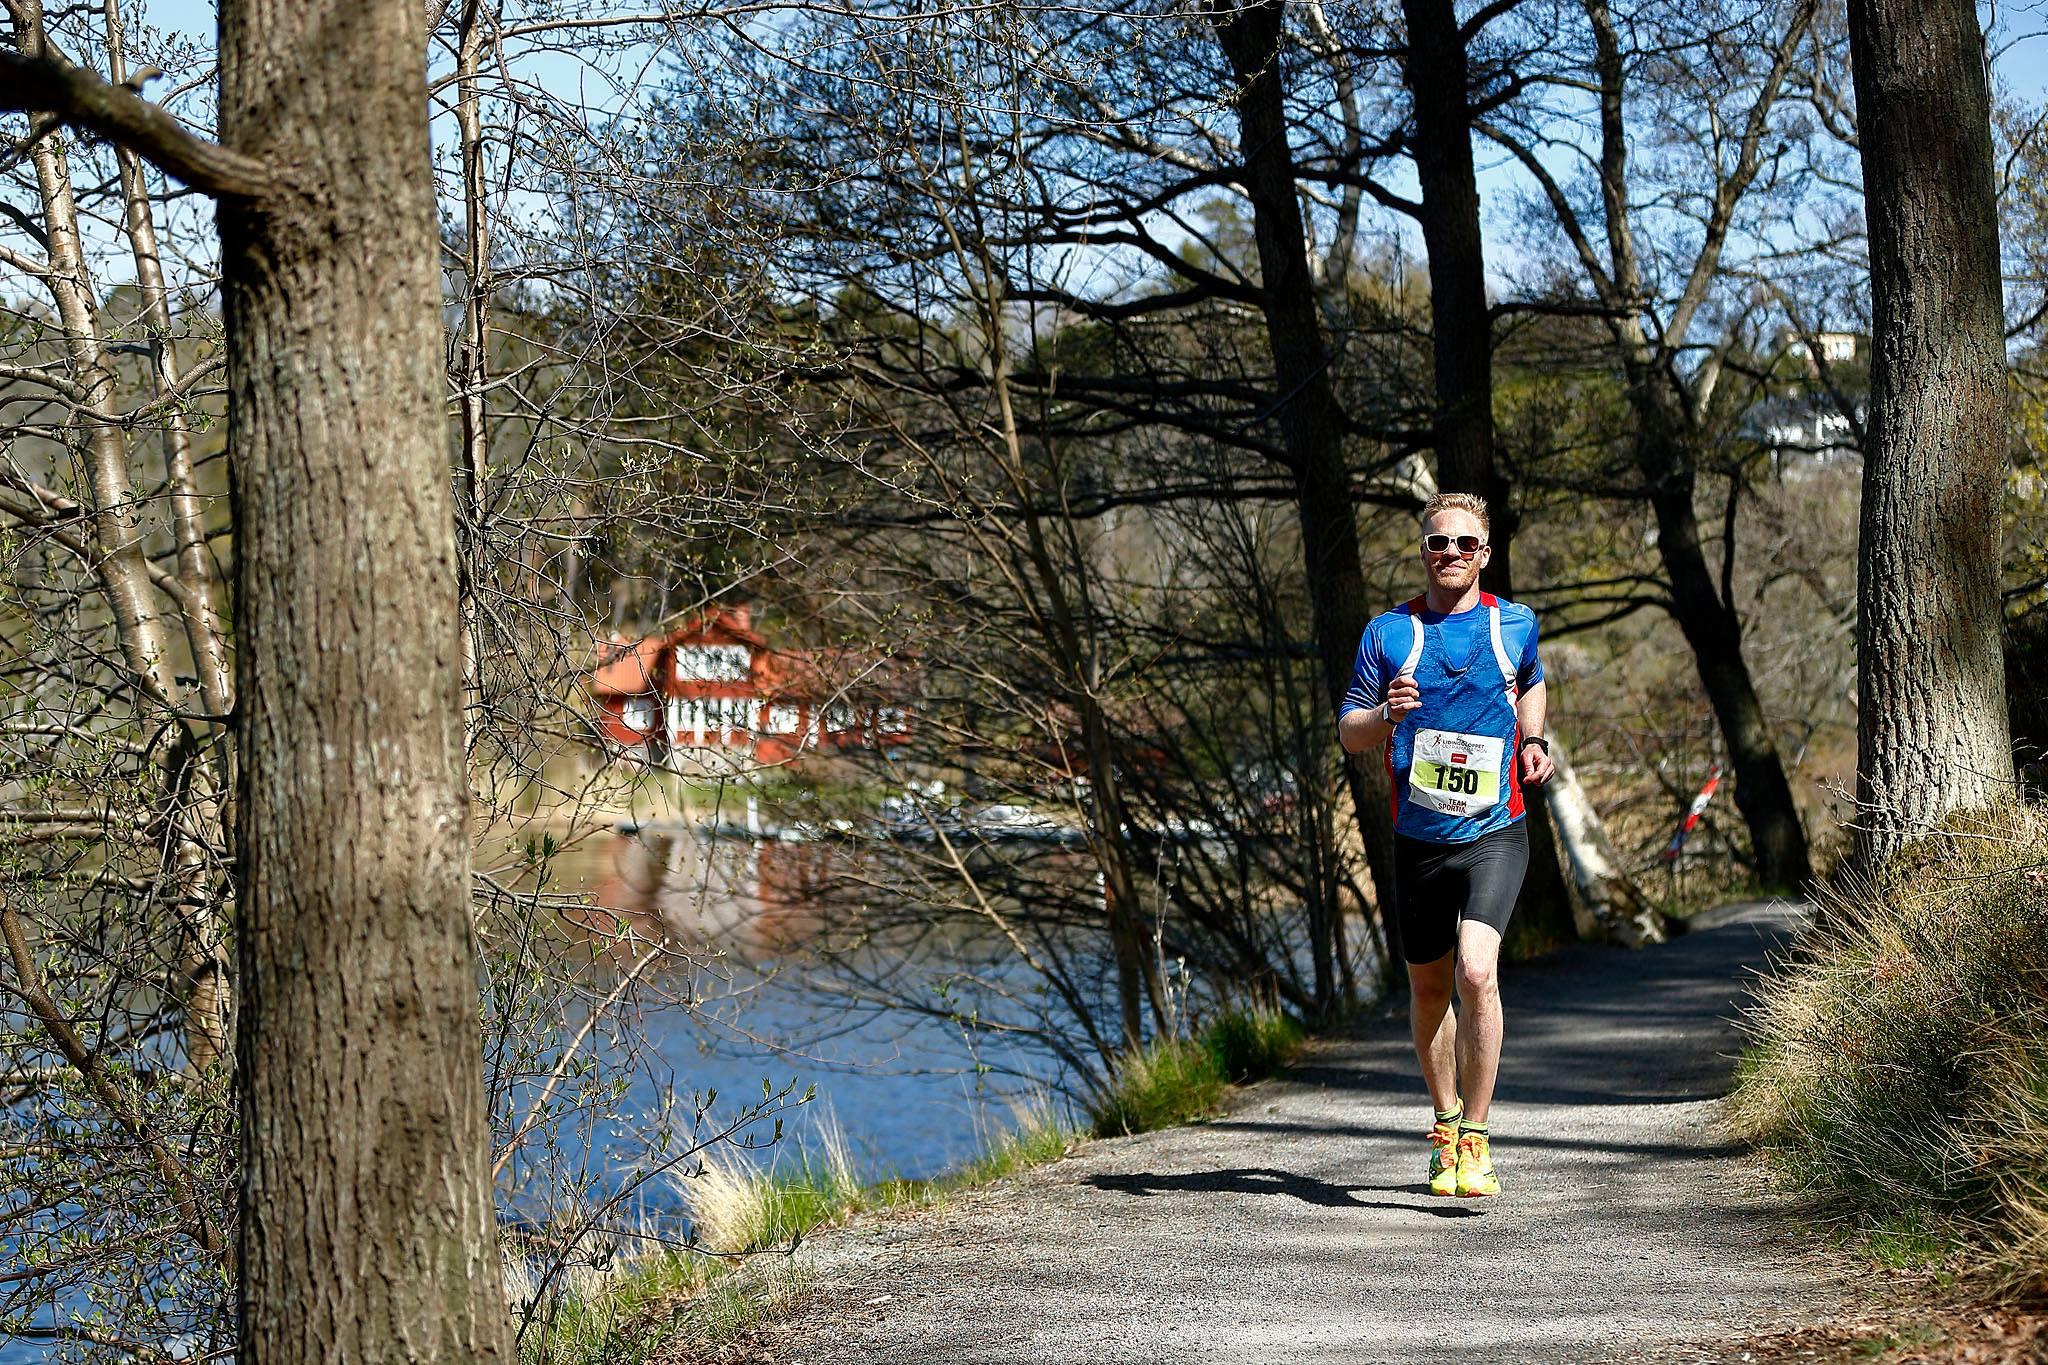 Lidingöloppet Ultra Marathon den 7 maj 2017 på Lidingö. Foto: Peter Holgersson AB.